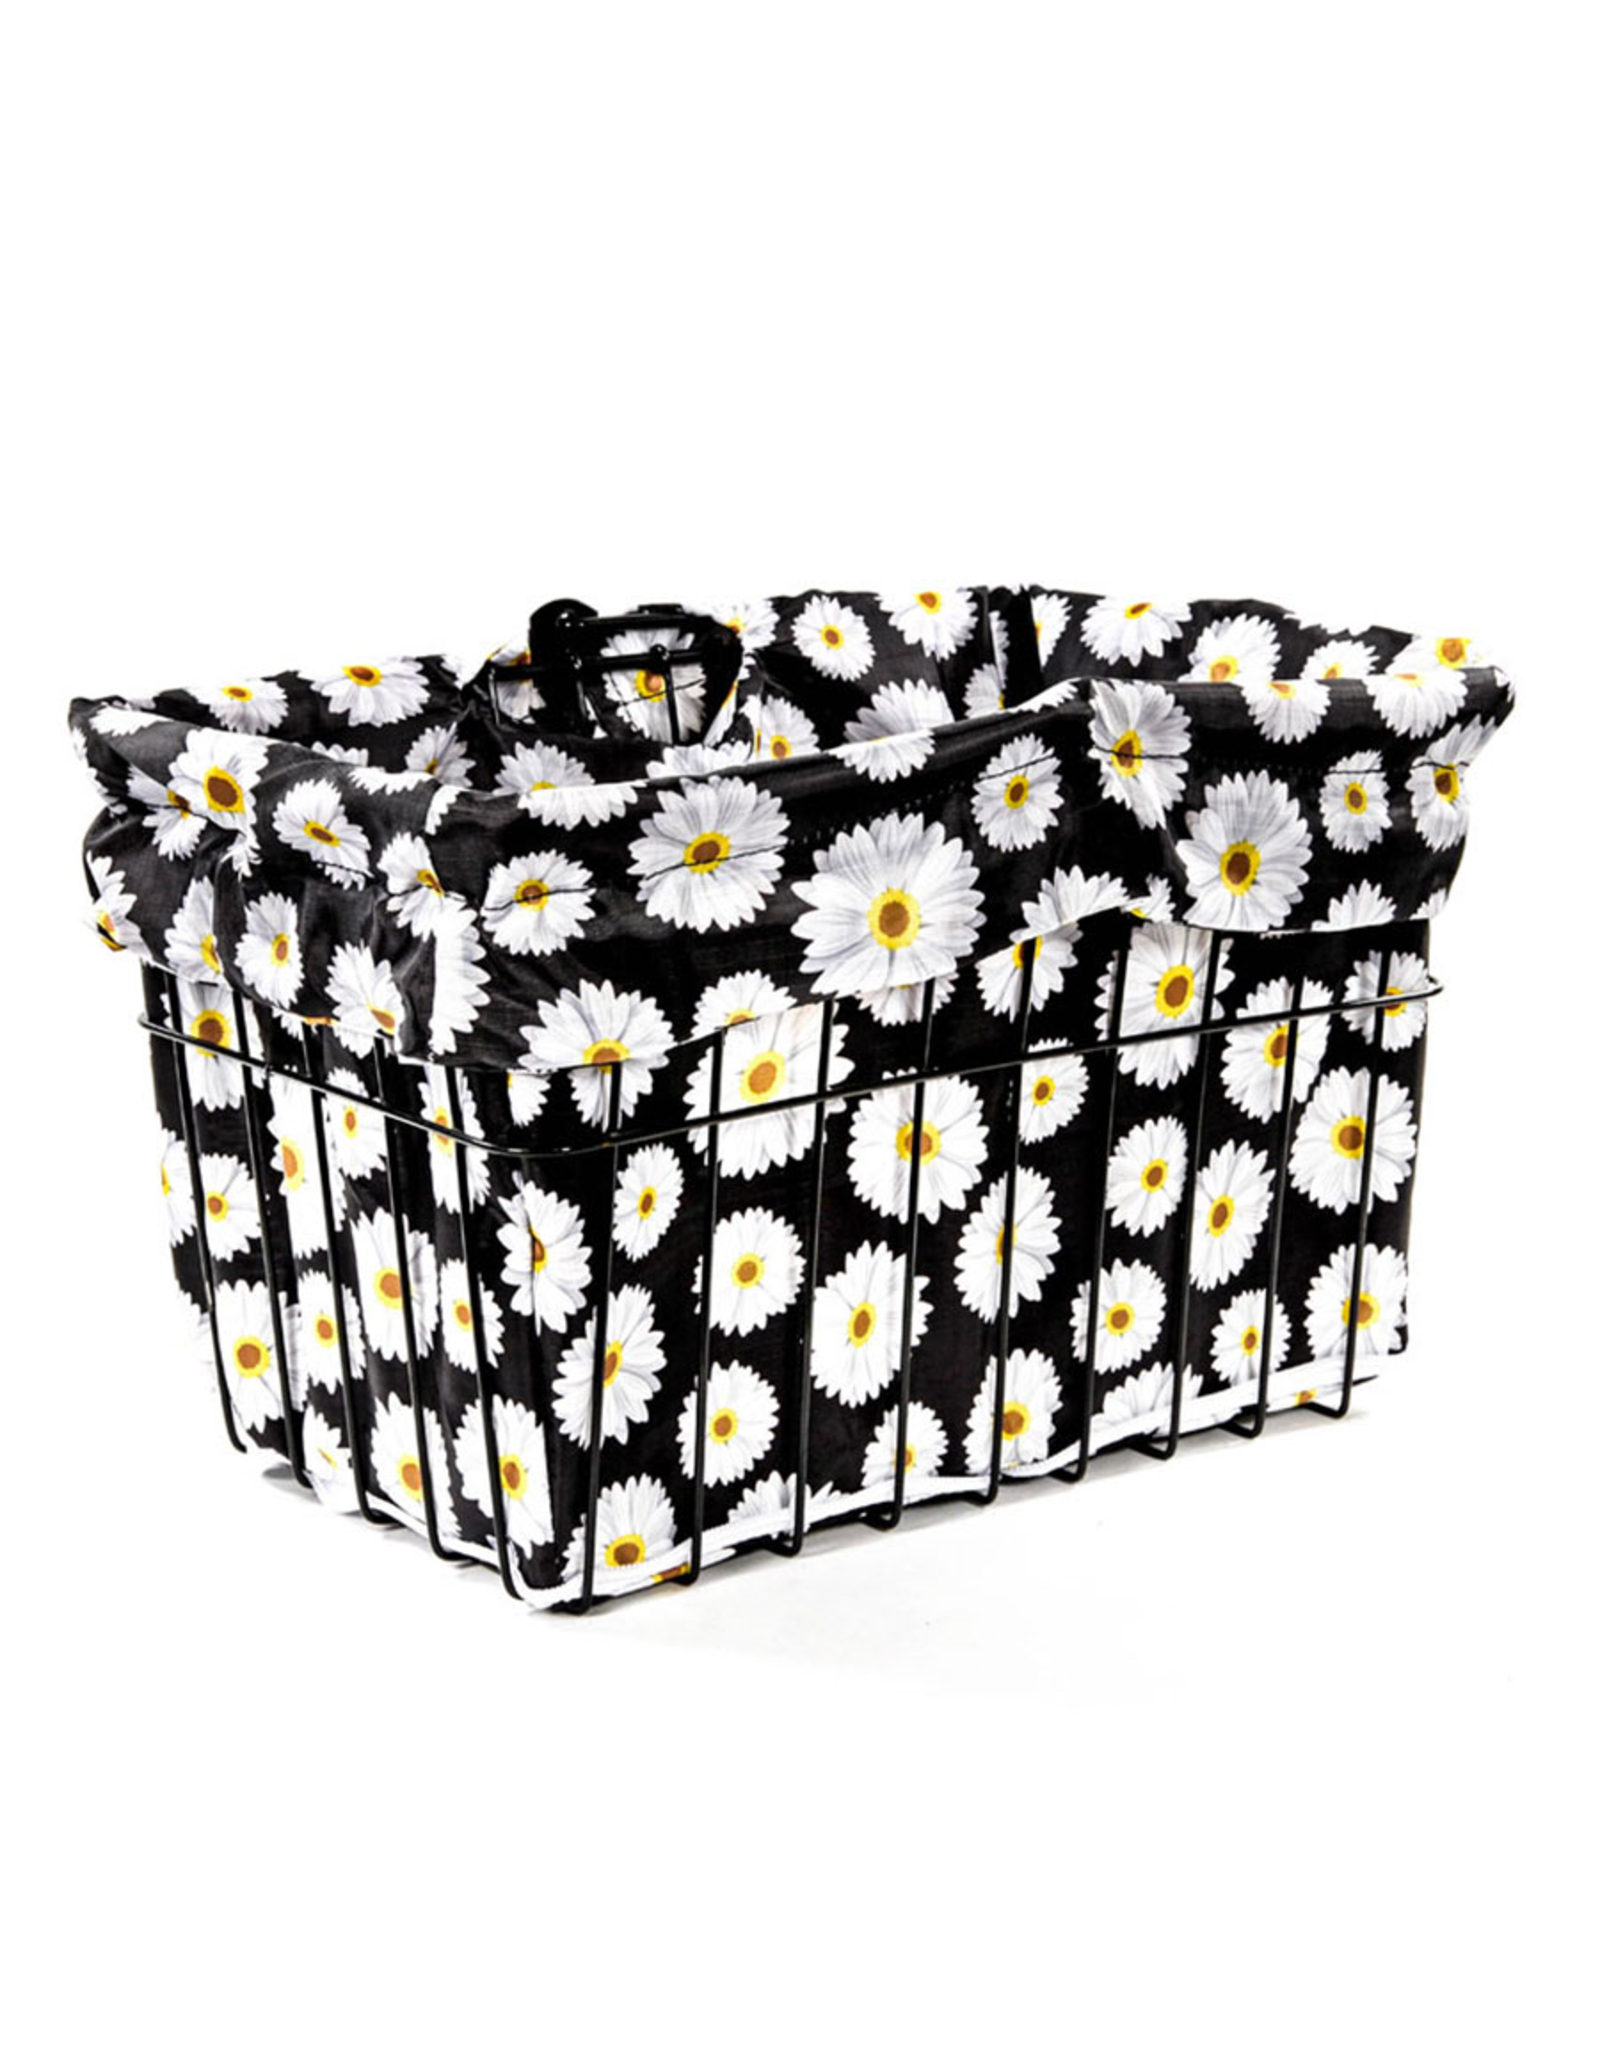 Cruiser Candy Cruiser Candy Basket Liner - Love, Daisy